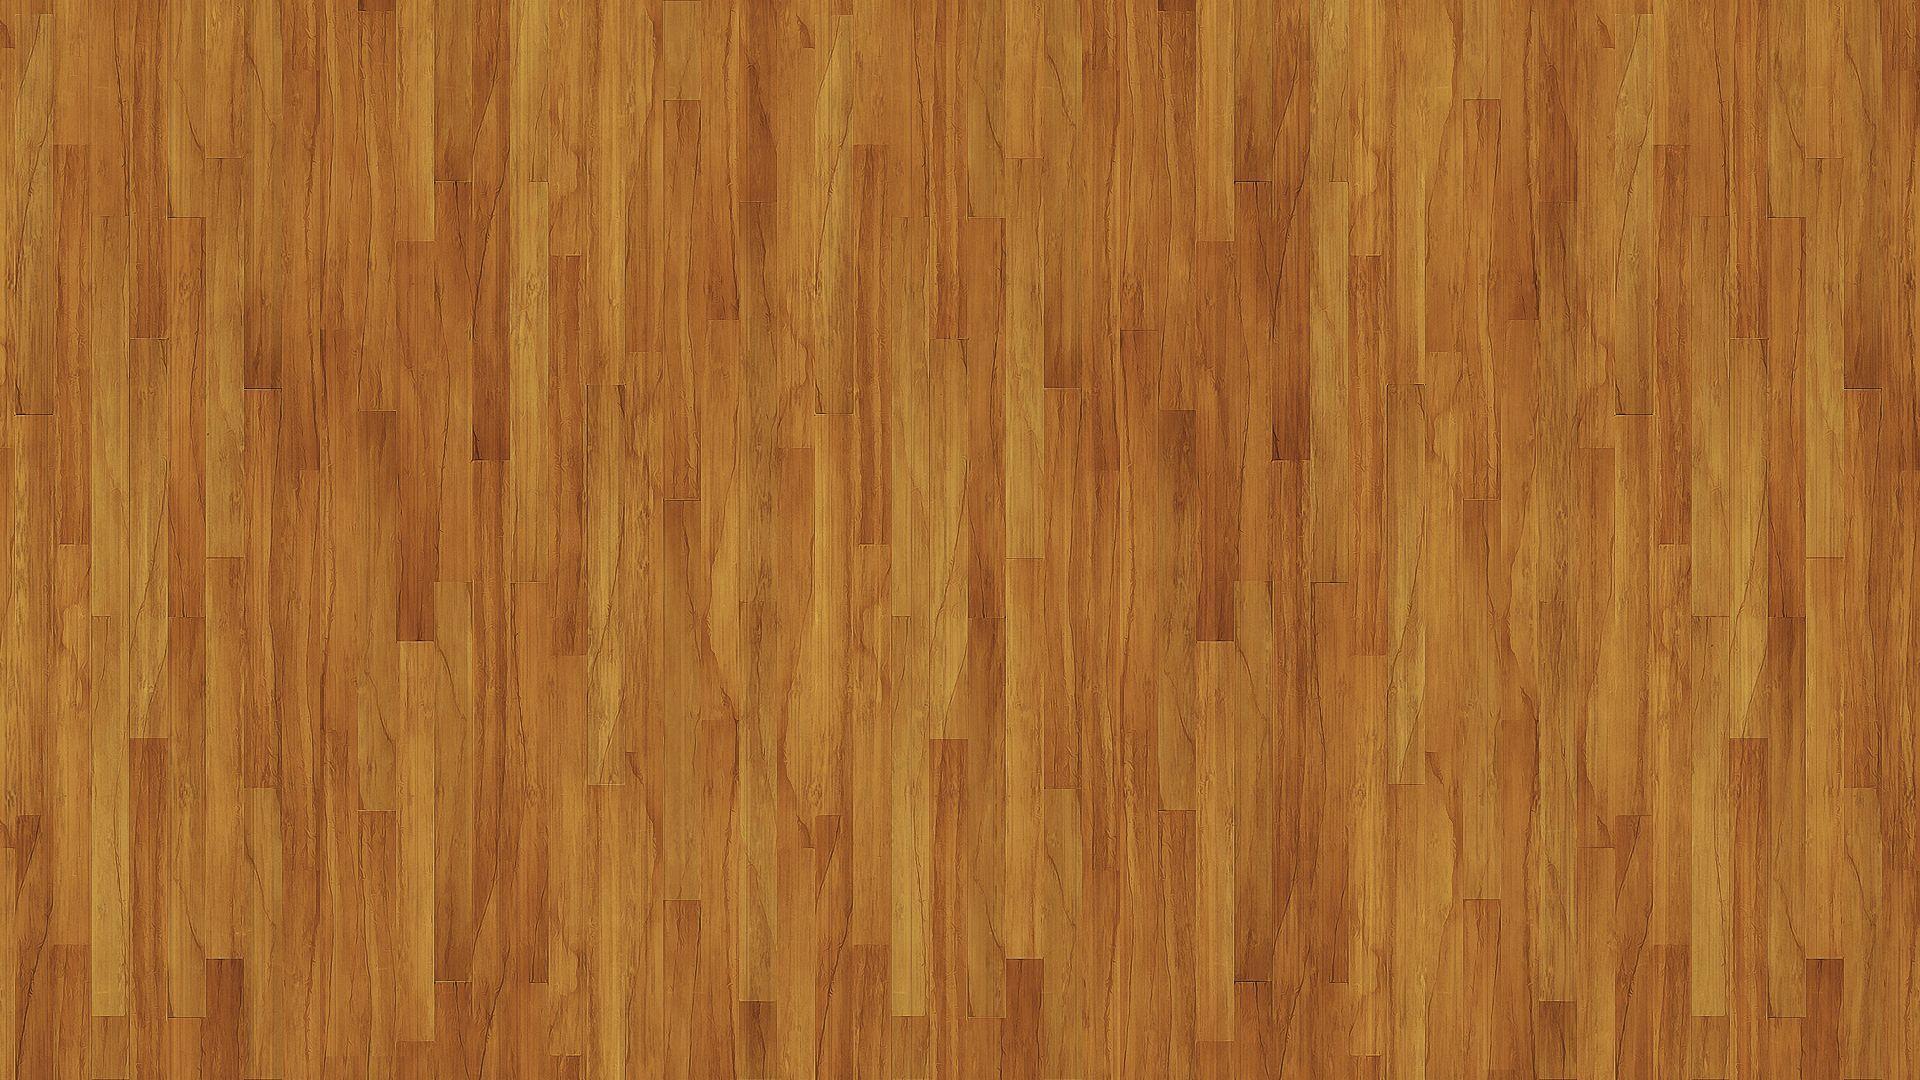 Wood Mobile Wallpaper Phone Wallpapers Light Wood Wallpaper Wooden Wallpaper Wood Wallpaper